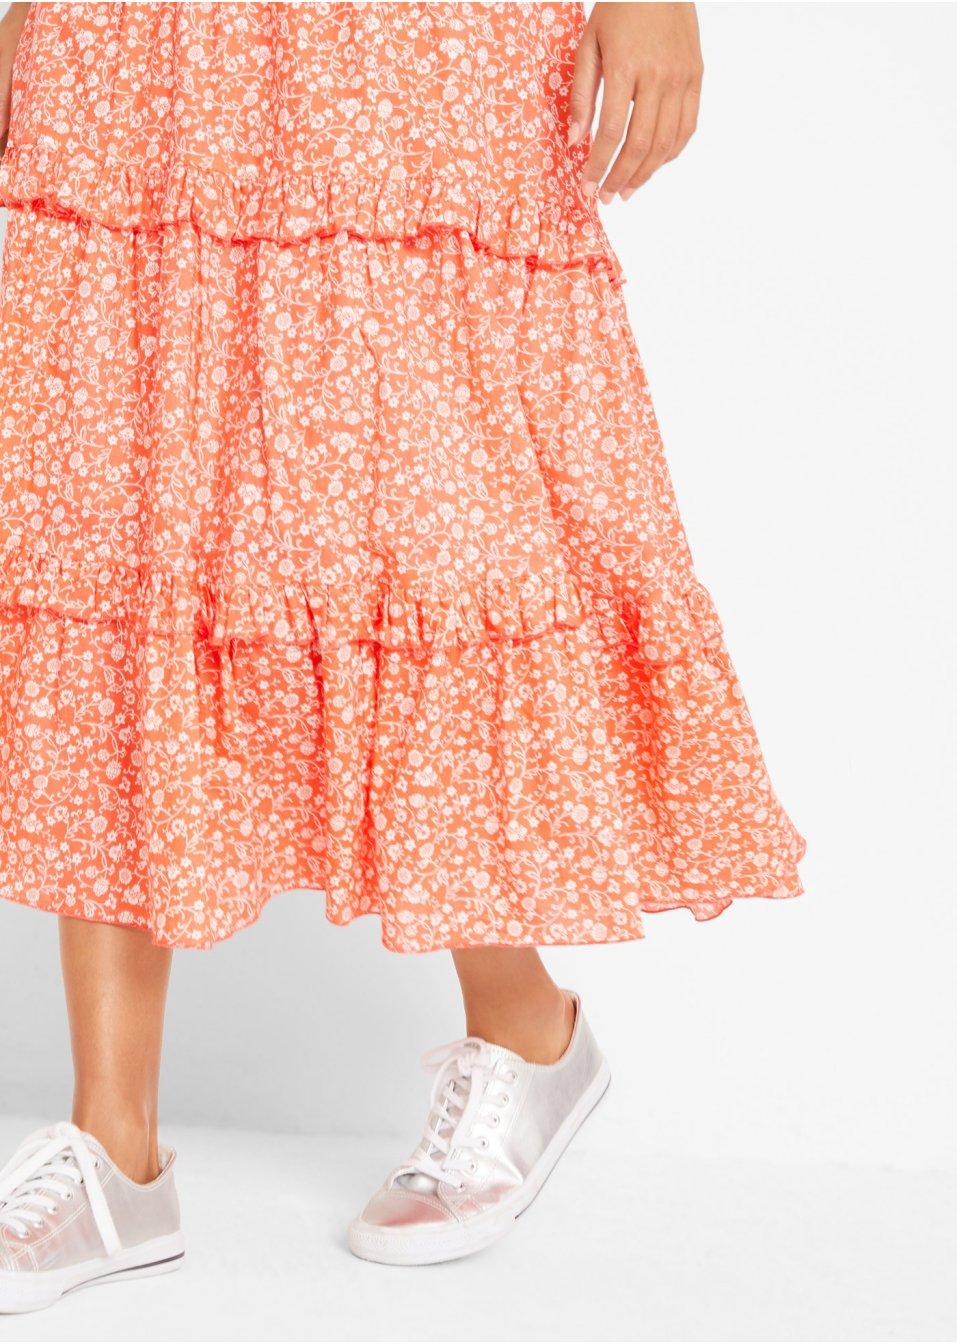 Mode Femme Vêtements DJLfdOFlkj Jupe Maite Kelly orange saumon/blanc imprimé Femme bpc  collection .fr